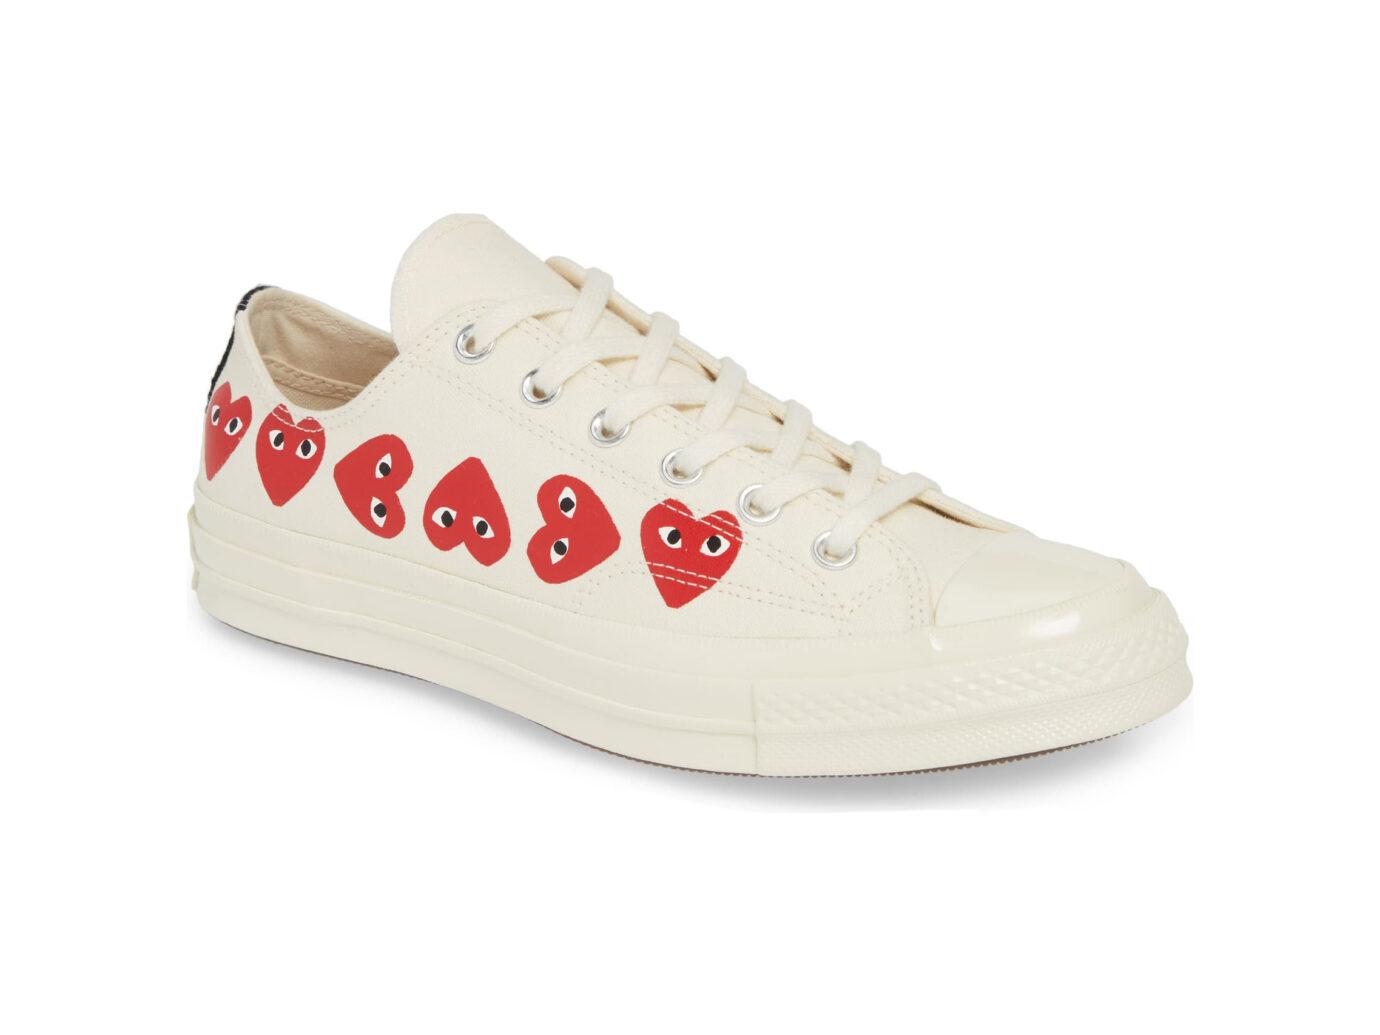 Comme des Garçons PLAY x Converse Sneakers